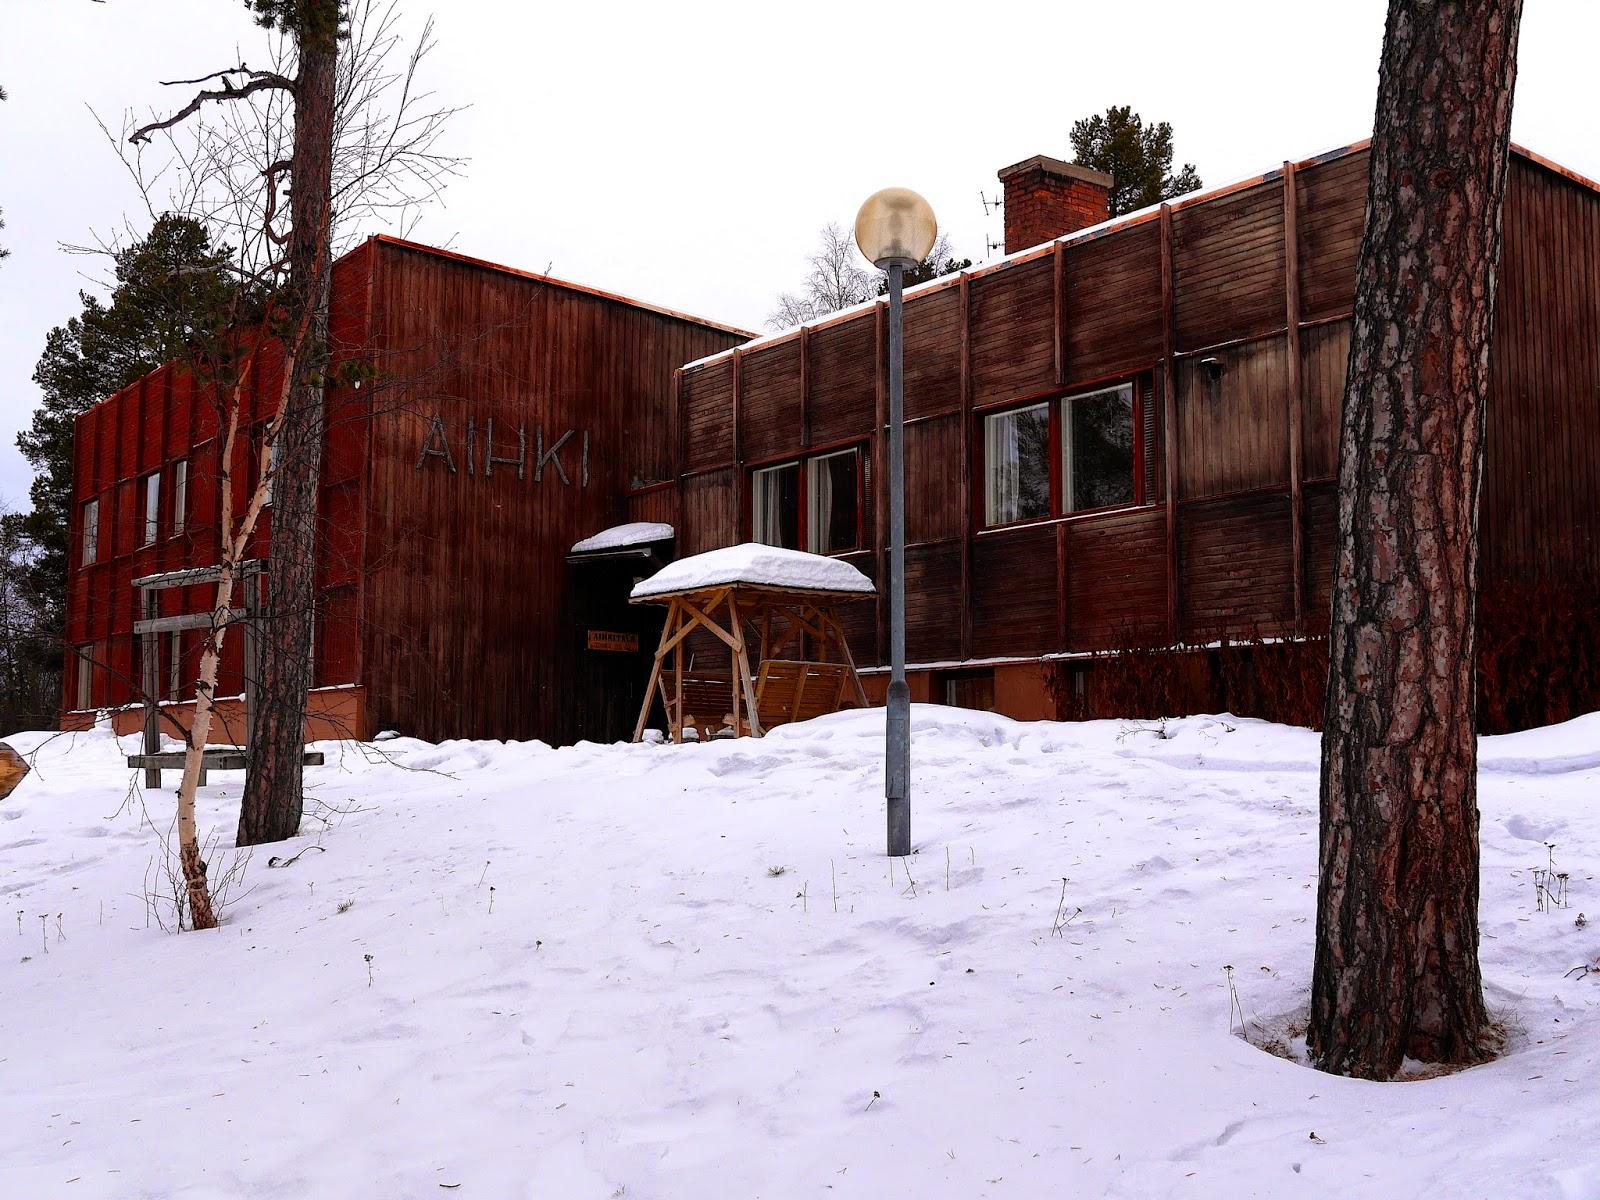 Hotel Korpikartano, Finland